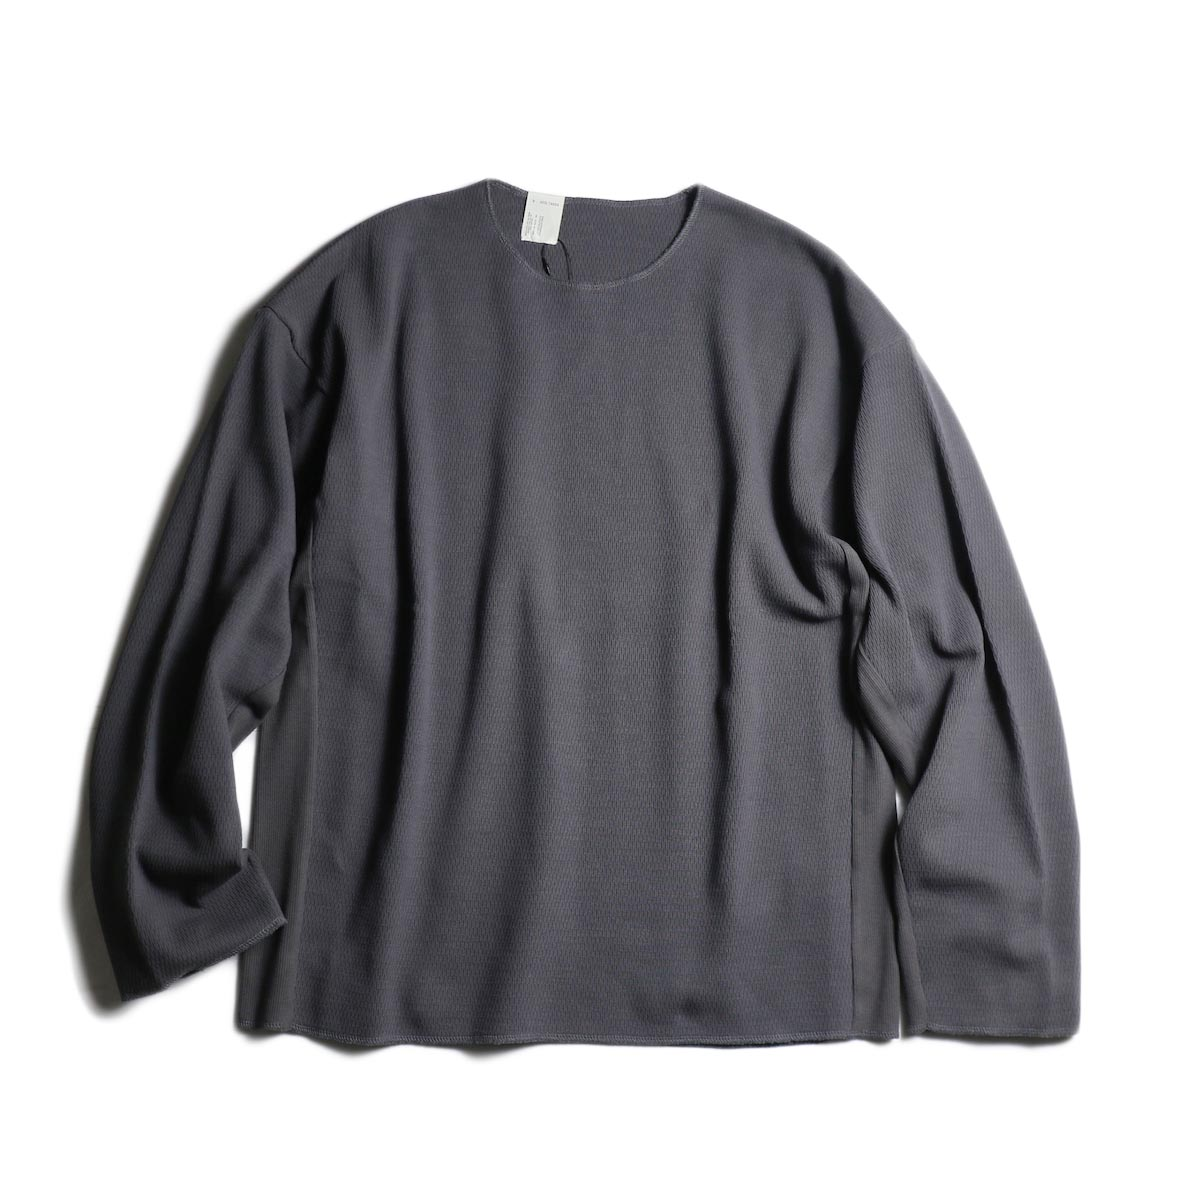 N.HOOLYWOOD / 1201-CS19-057 Thermal Long Sleeve T-Shirts (Charcoal)